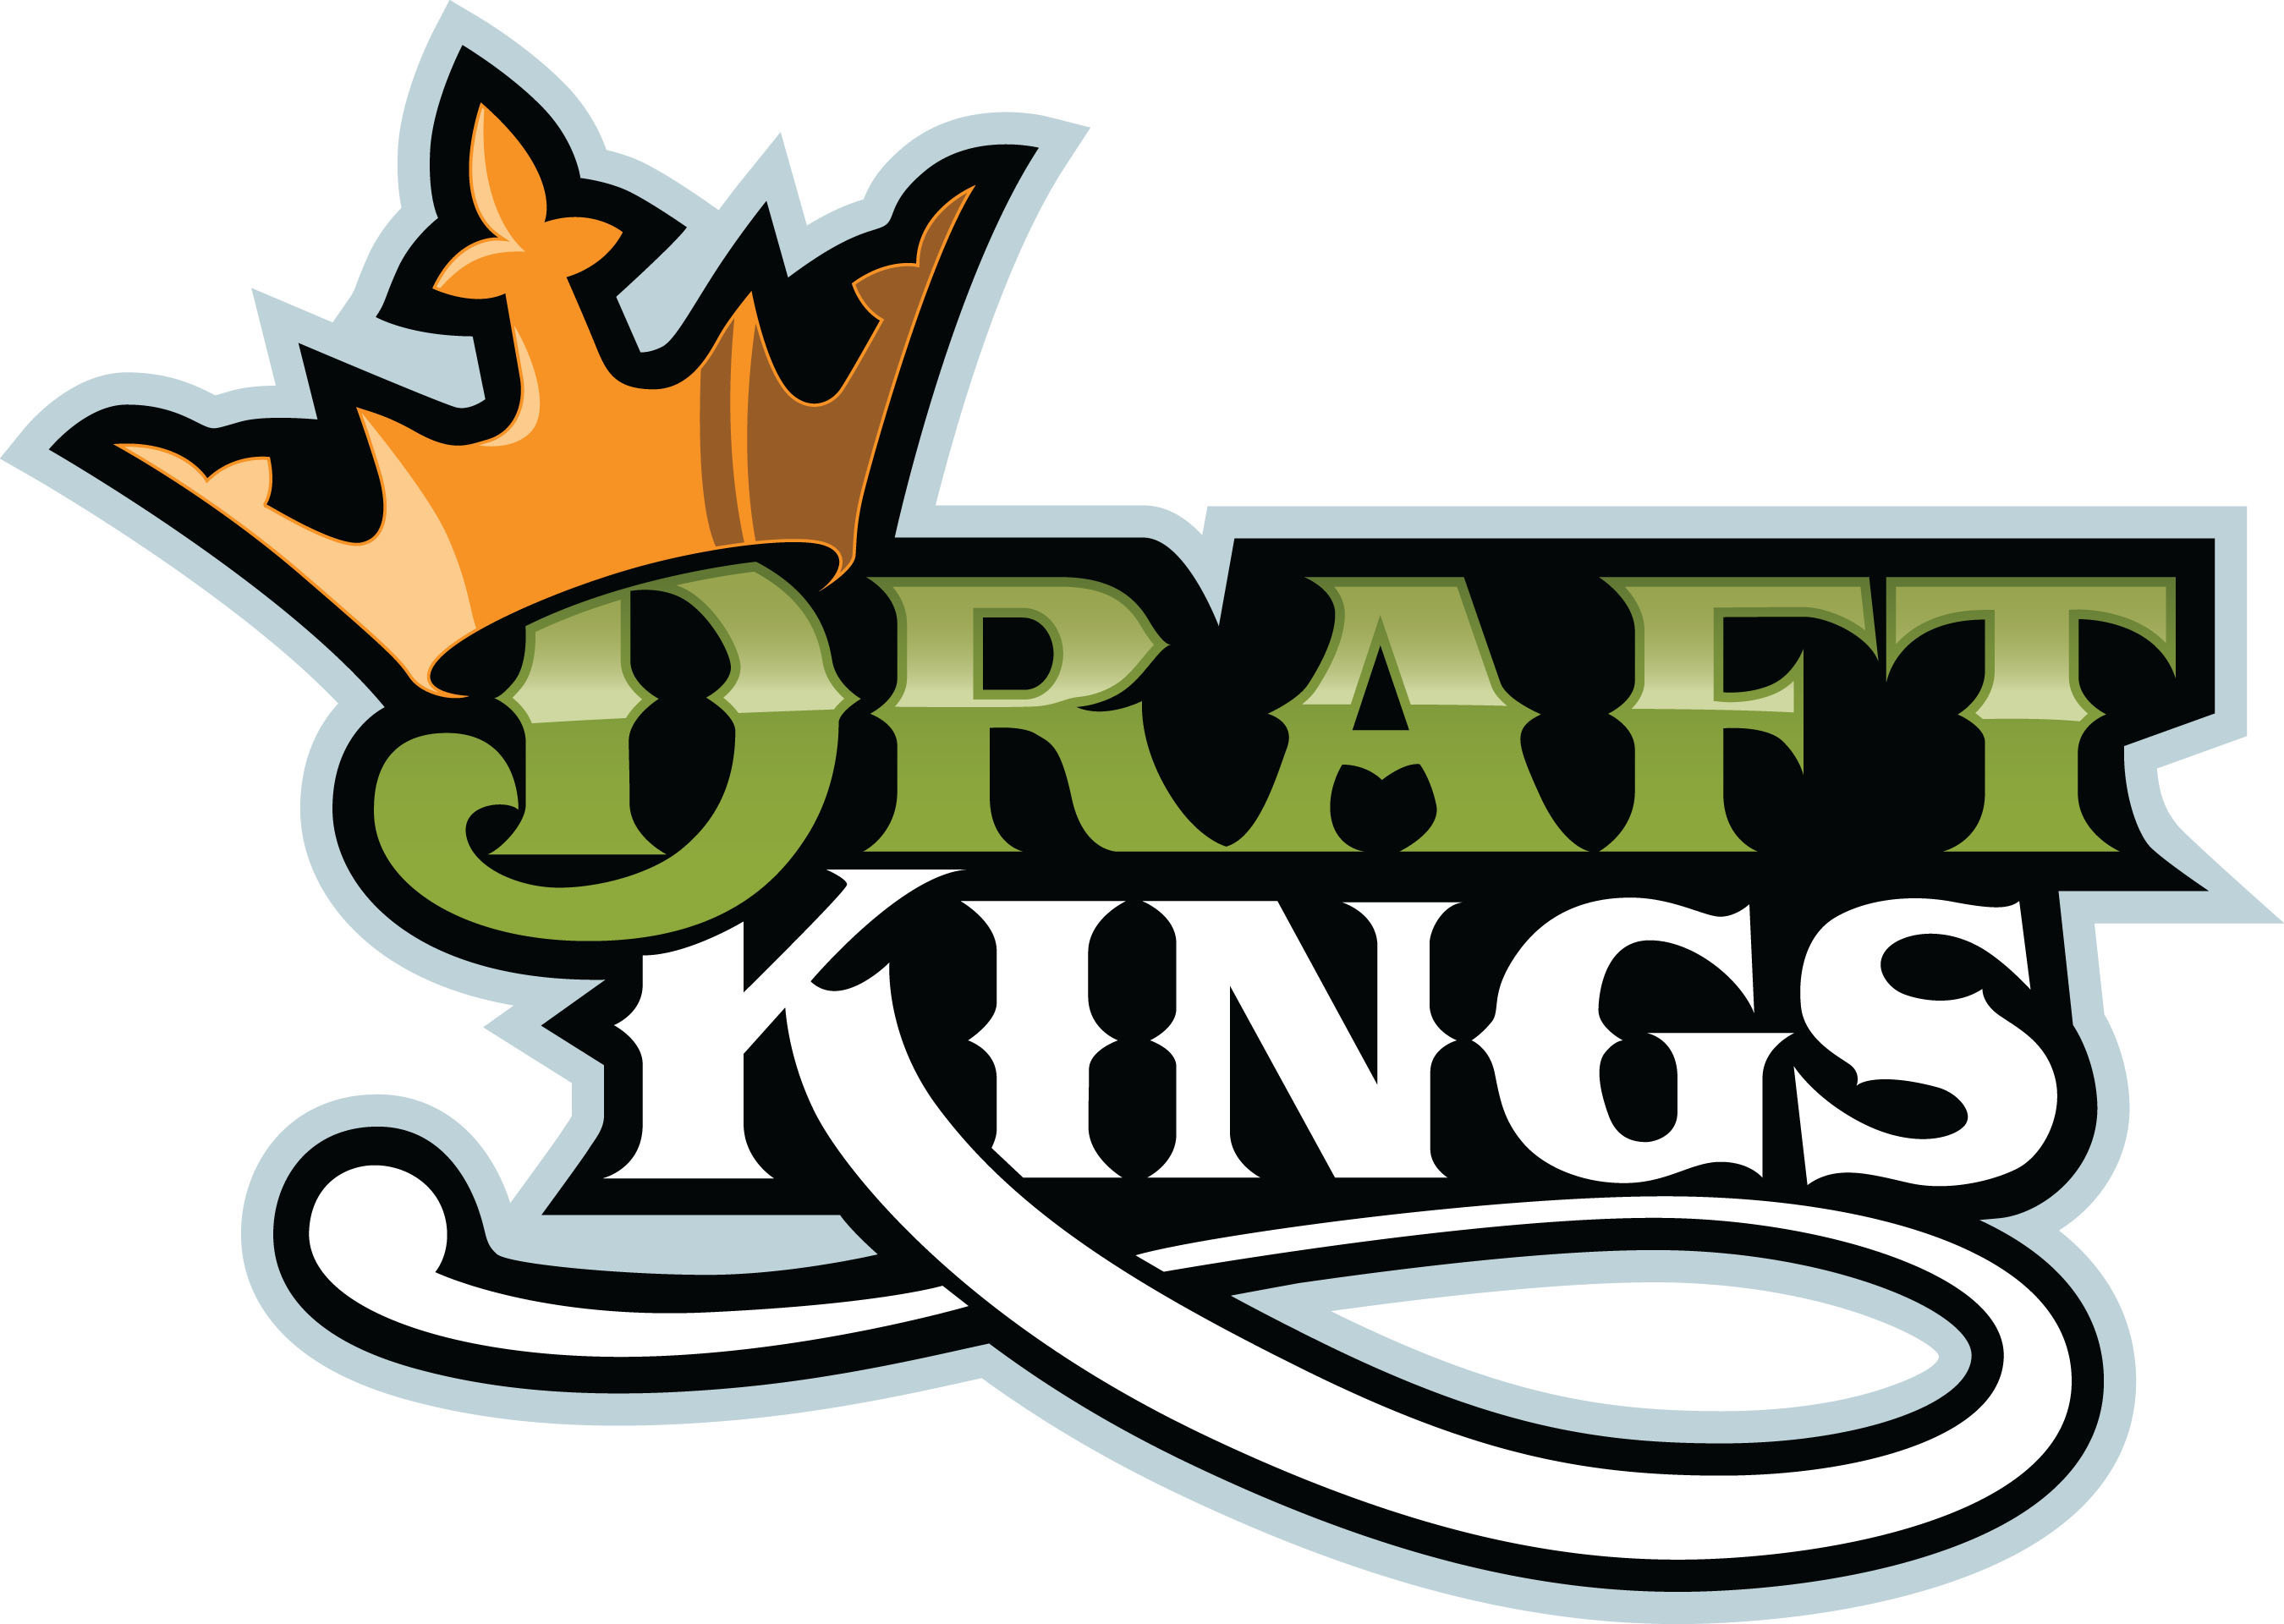 DraftKings logo. (PRNewsFoto/DraftKings, Inc.)